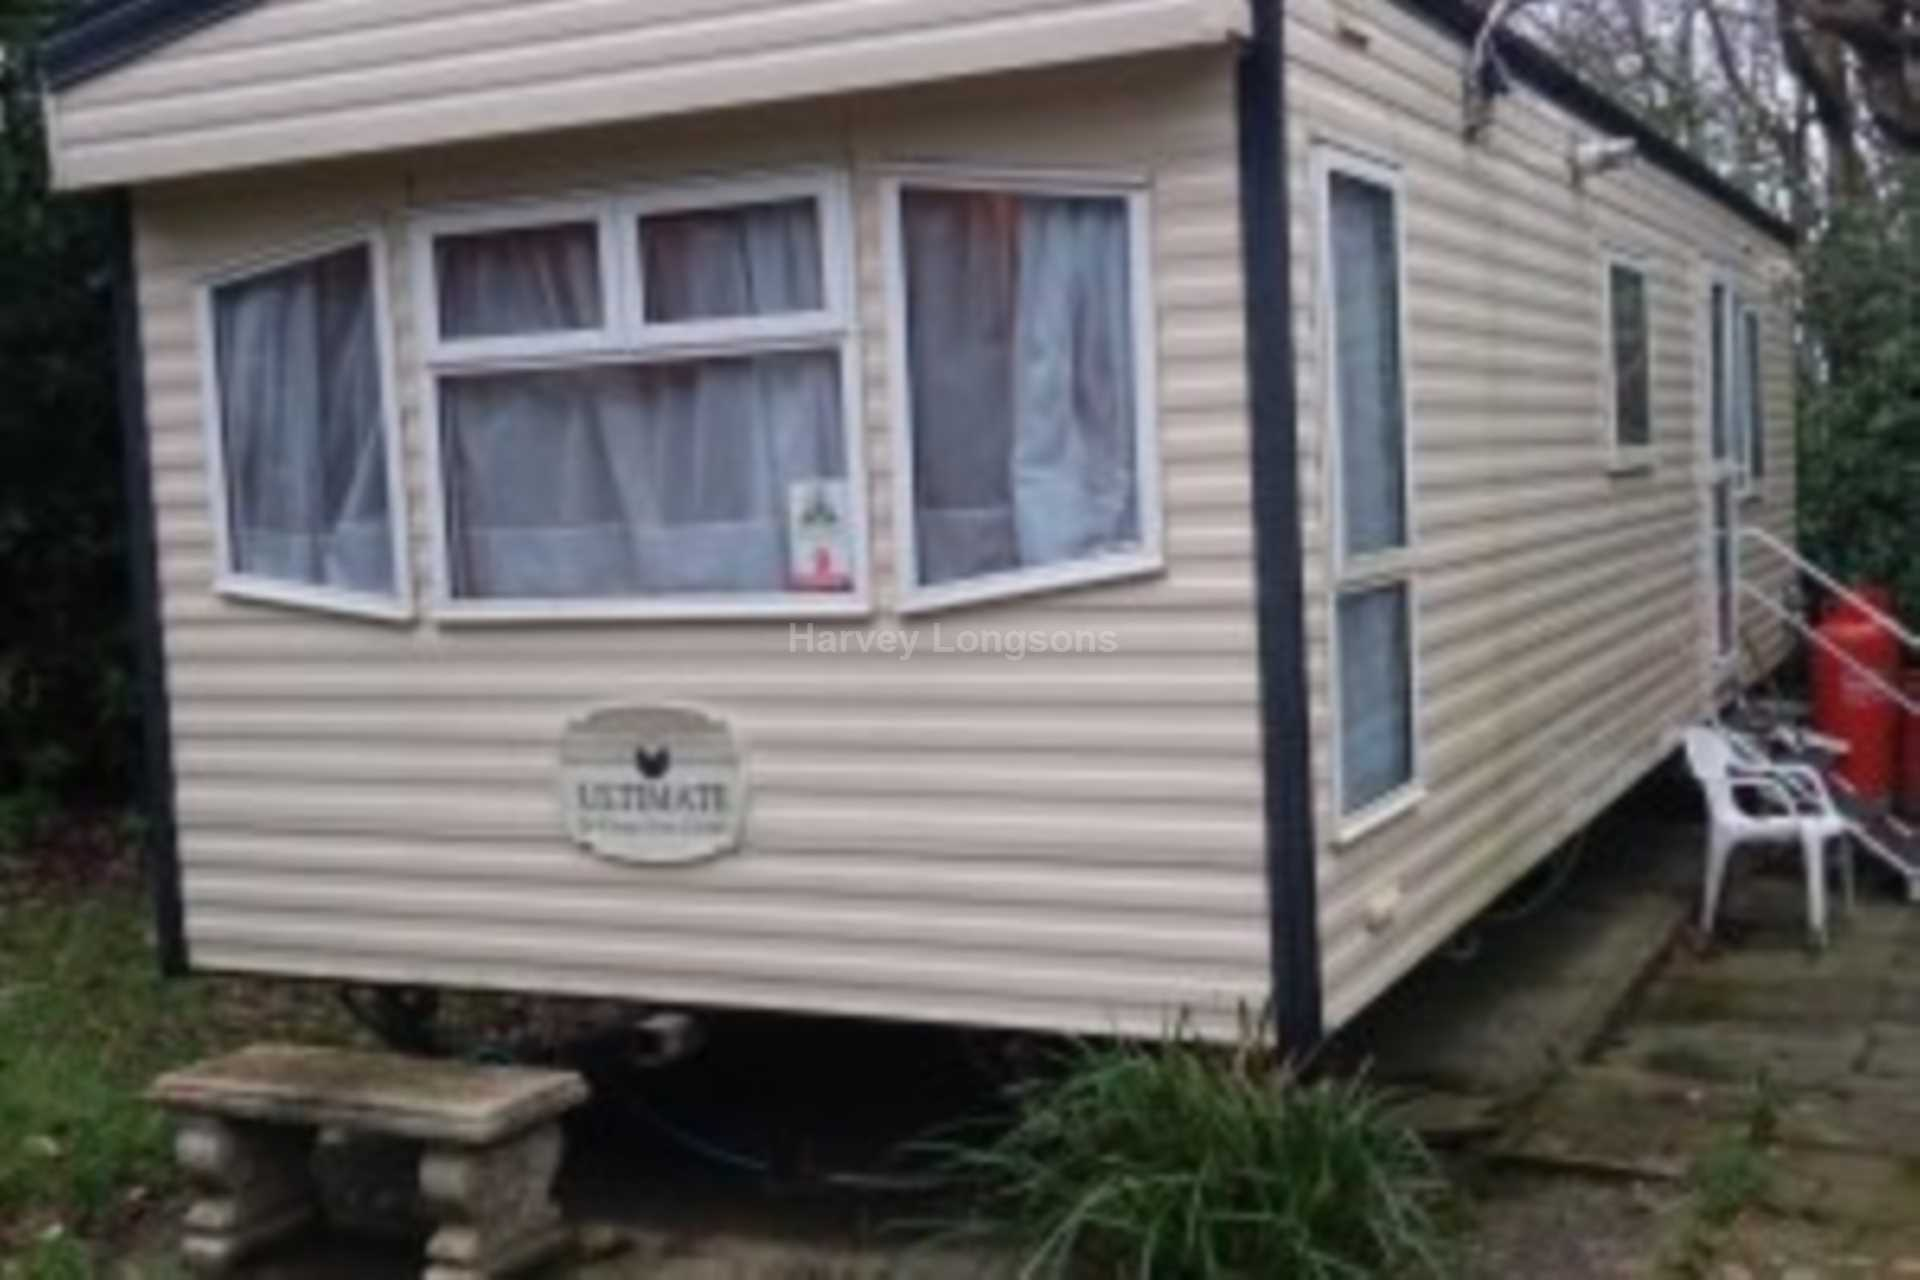 Beautiful Combe Haven Static Caravan Holiday Let In Hastings